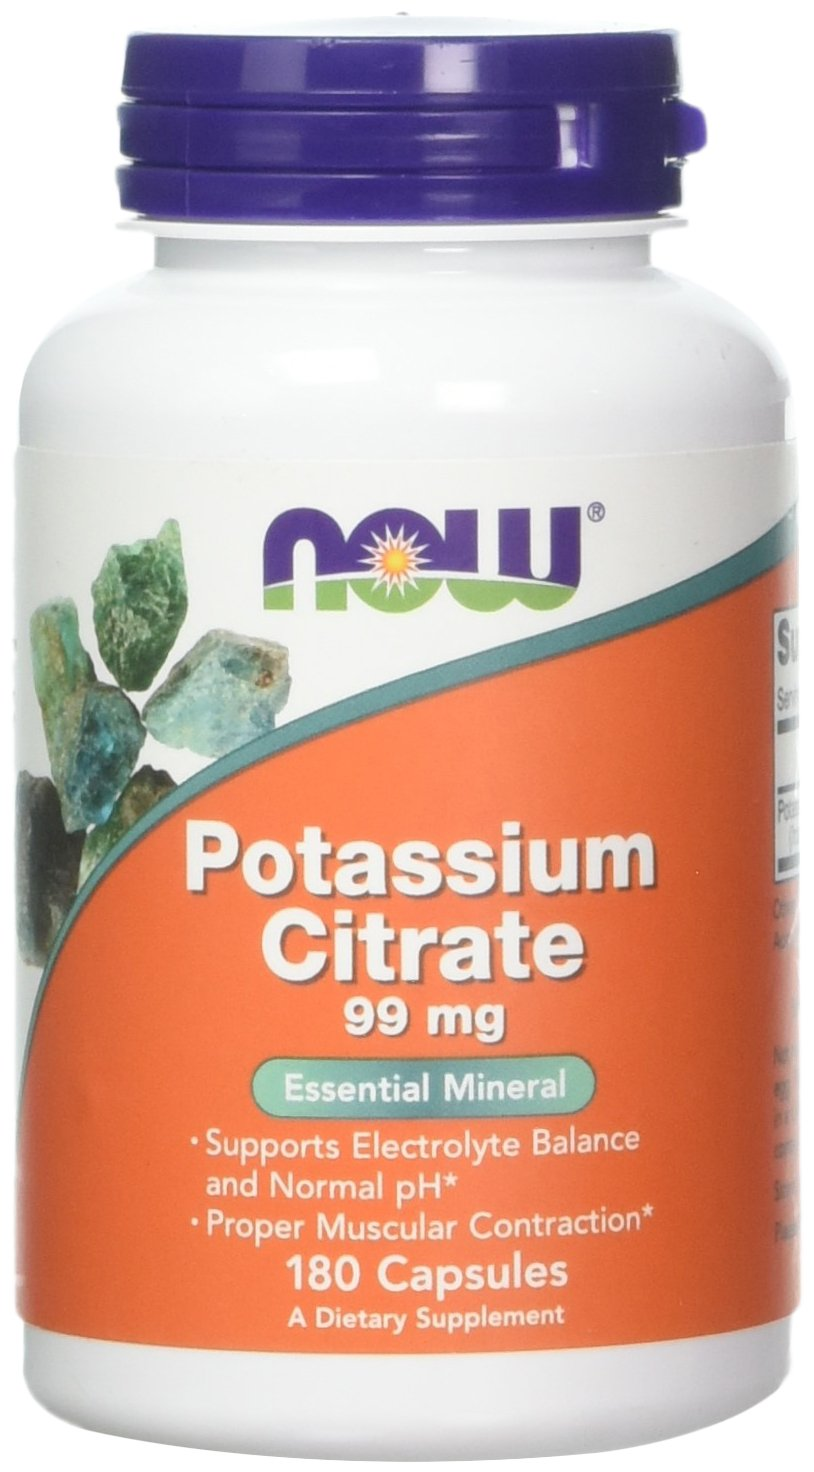 Potassium Citrate 99 mg 180 Capsules (Pack of 2)